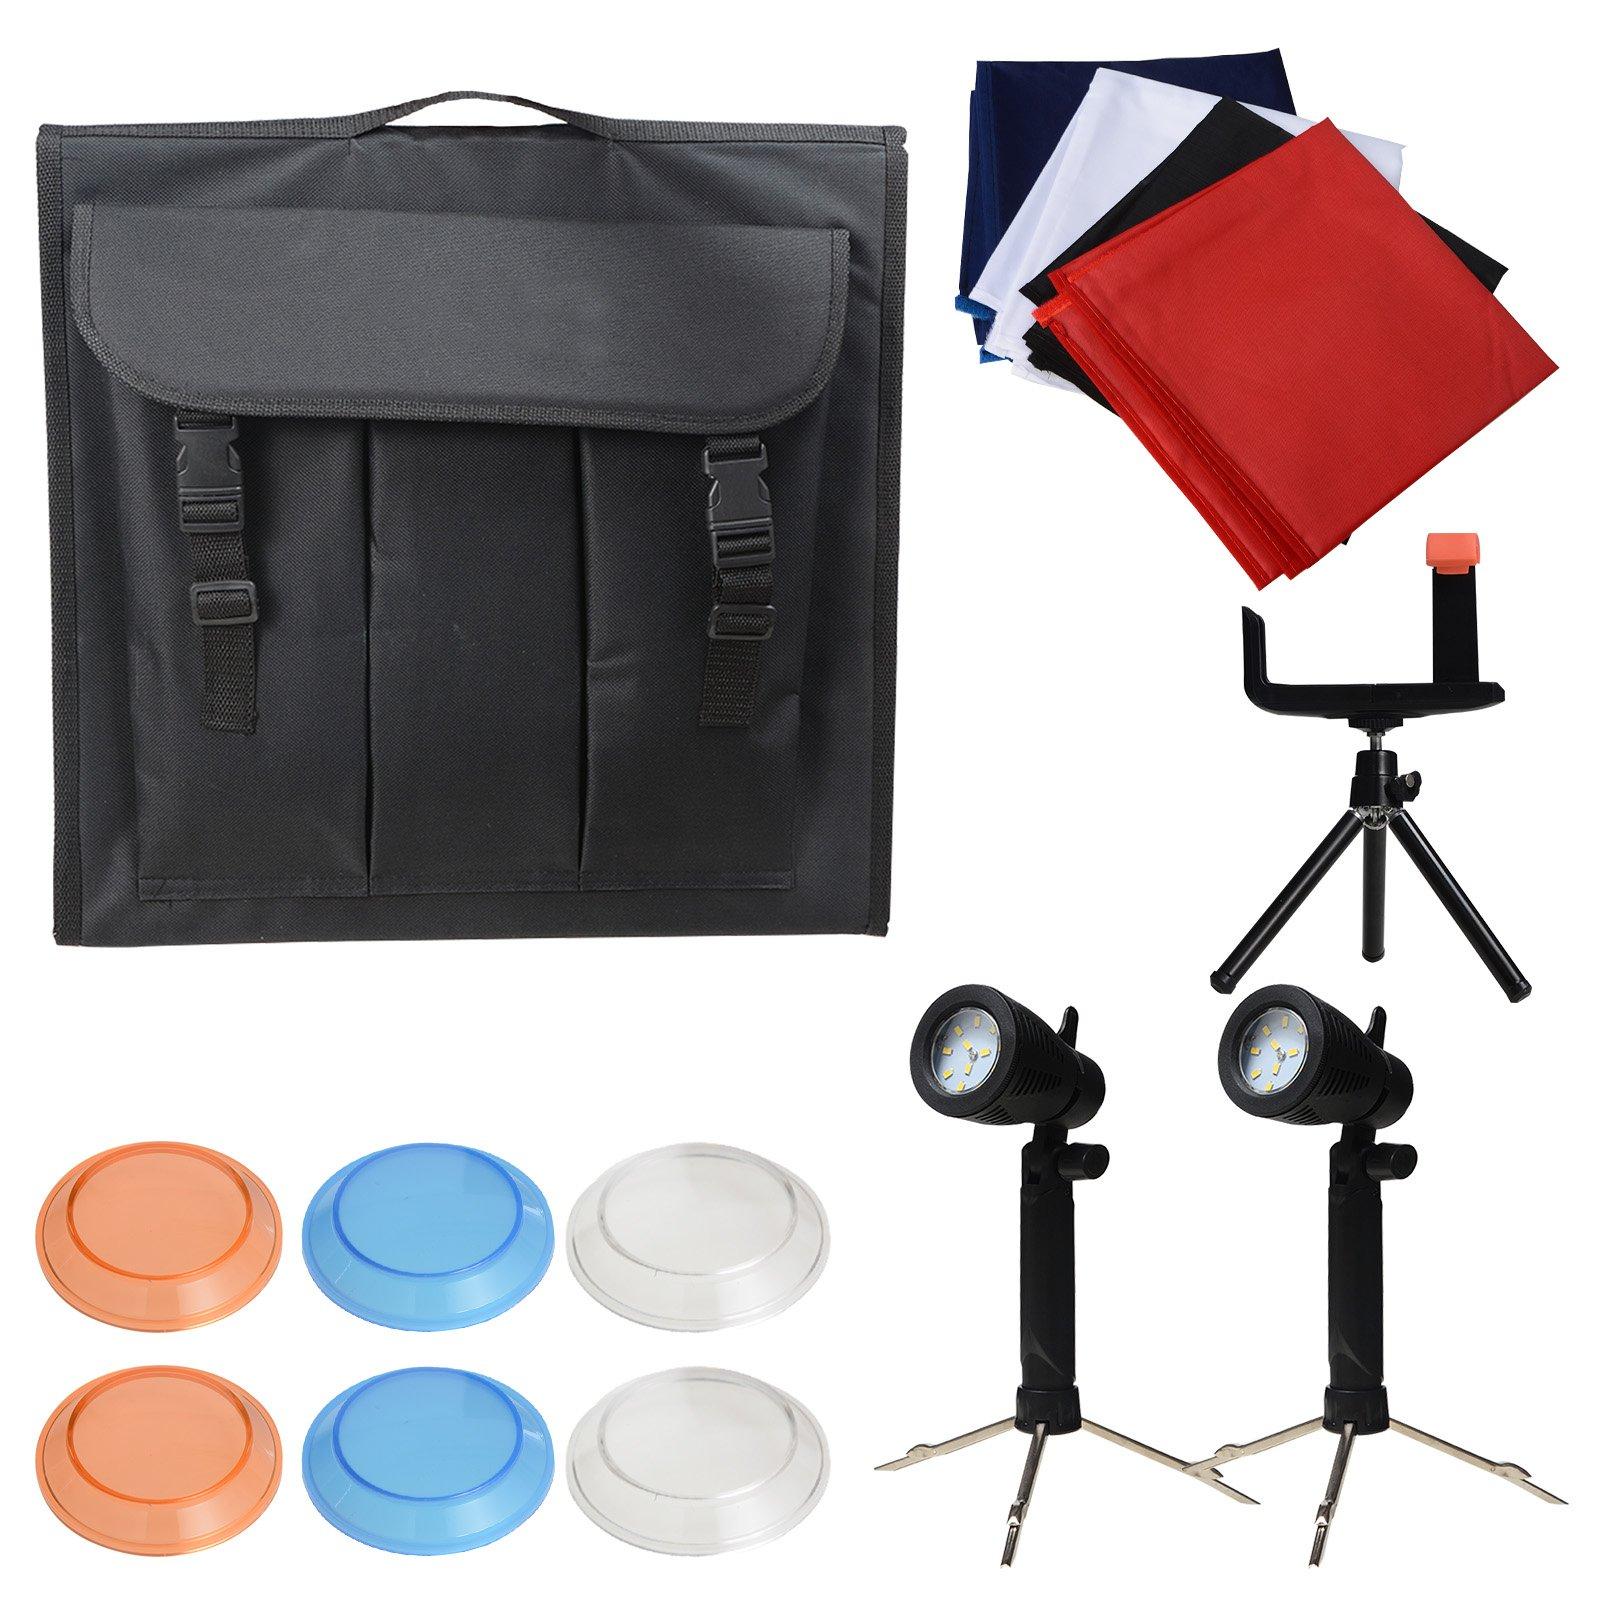 Voilamart Photo Shooting Tent Mini LED Studio Photo Box Portable Photography Cube Box with Four Backdrops, 5500K Continuous Lighting Kit, 40x40cm/16x16 Inch